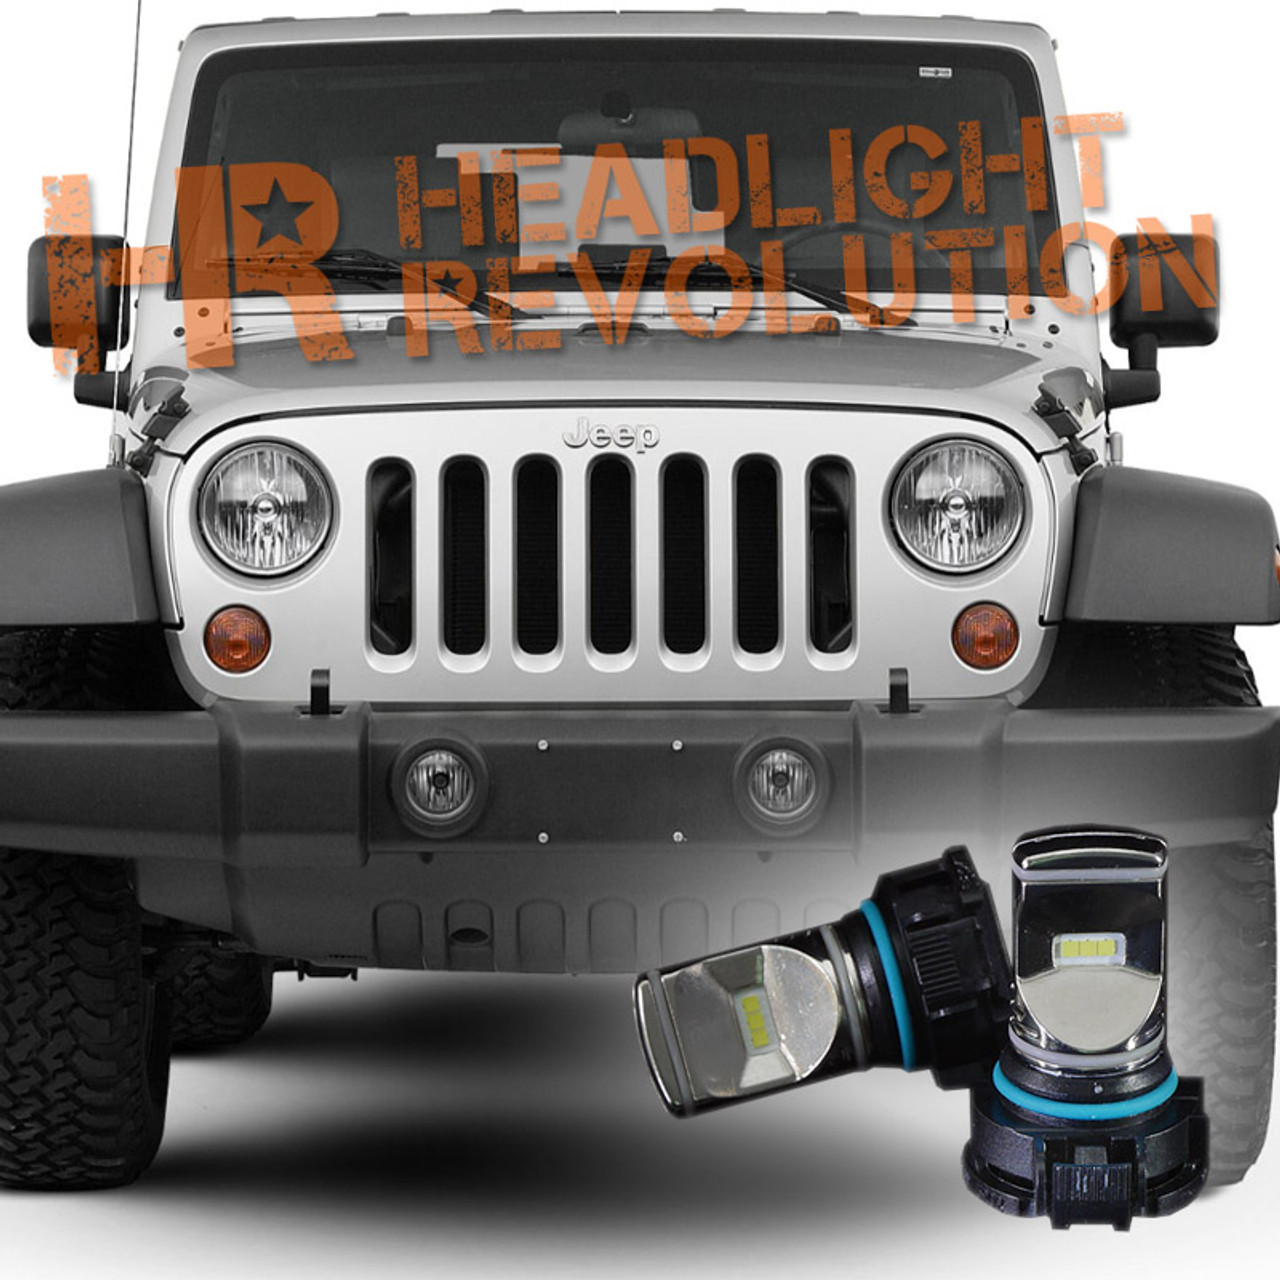 medium resolution of wiring diagram also evo jeep jk front bumper lights on jeep jk fog diagram also evo jeep jk front bumper lights on jeep jk fog light